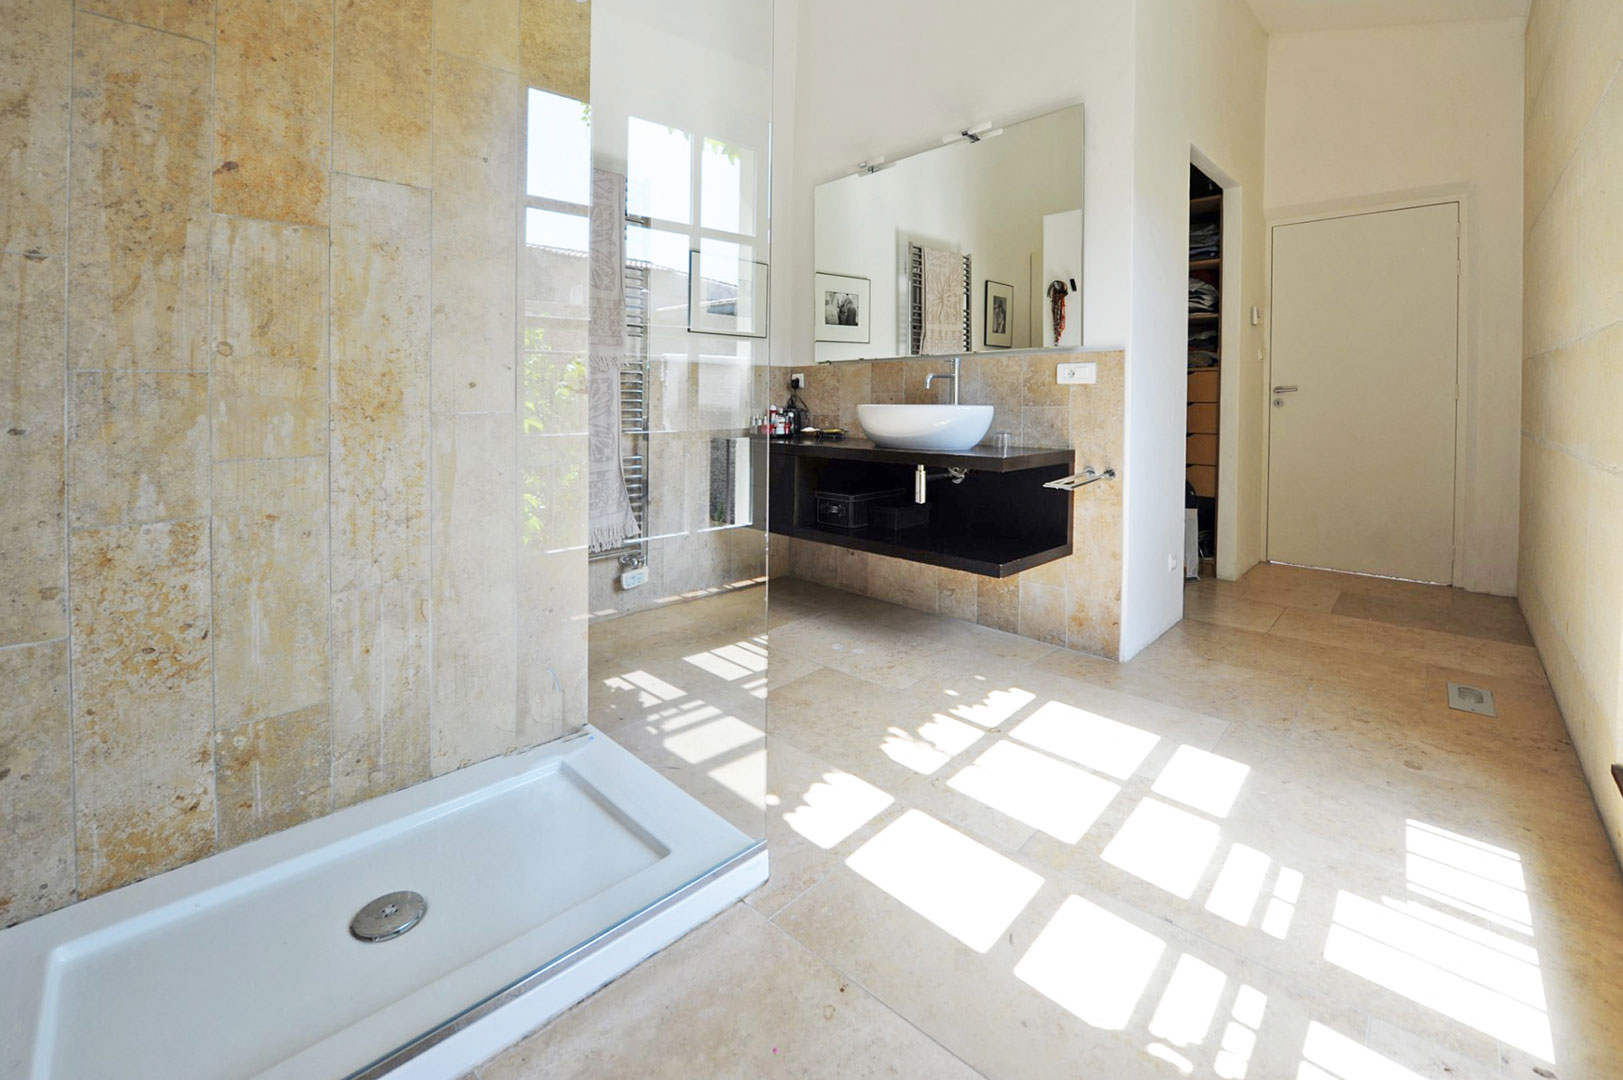 Salle de bains en pierres